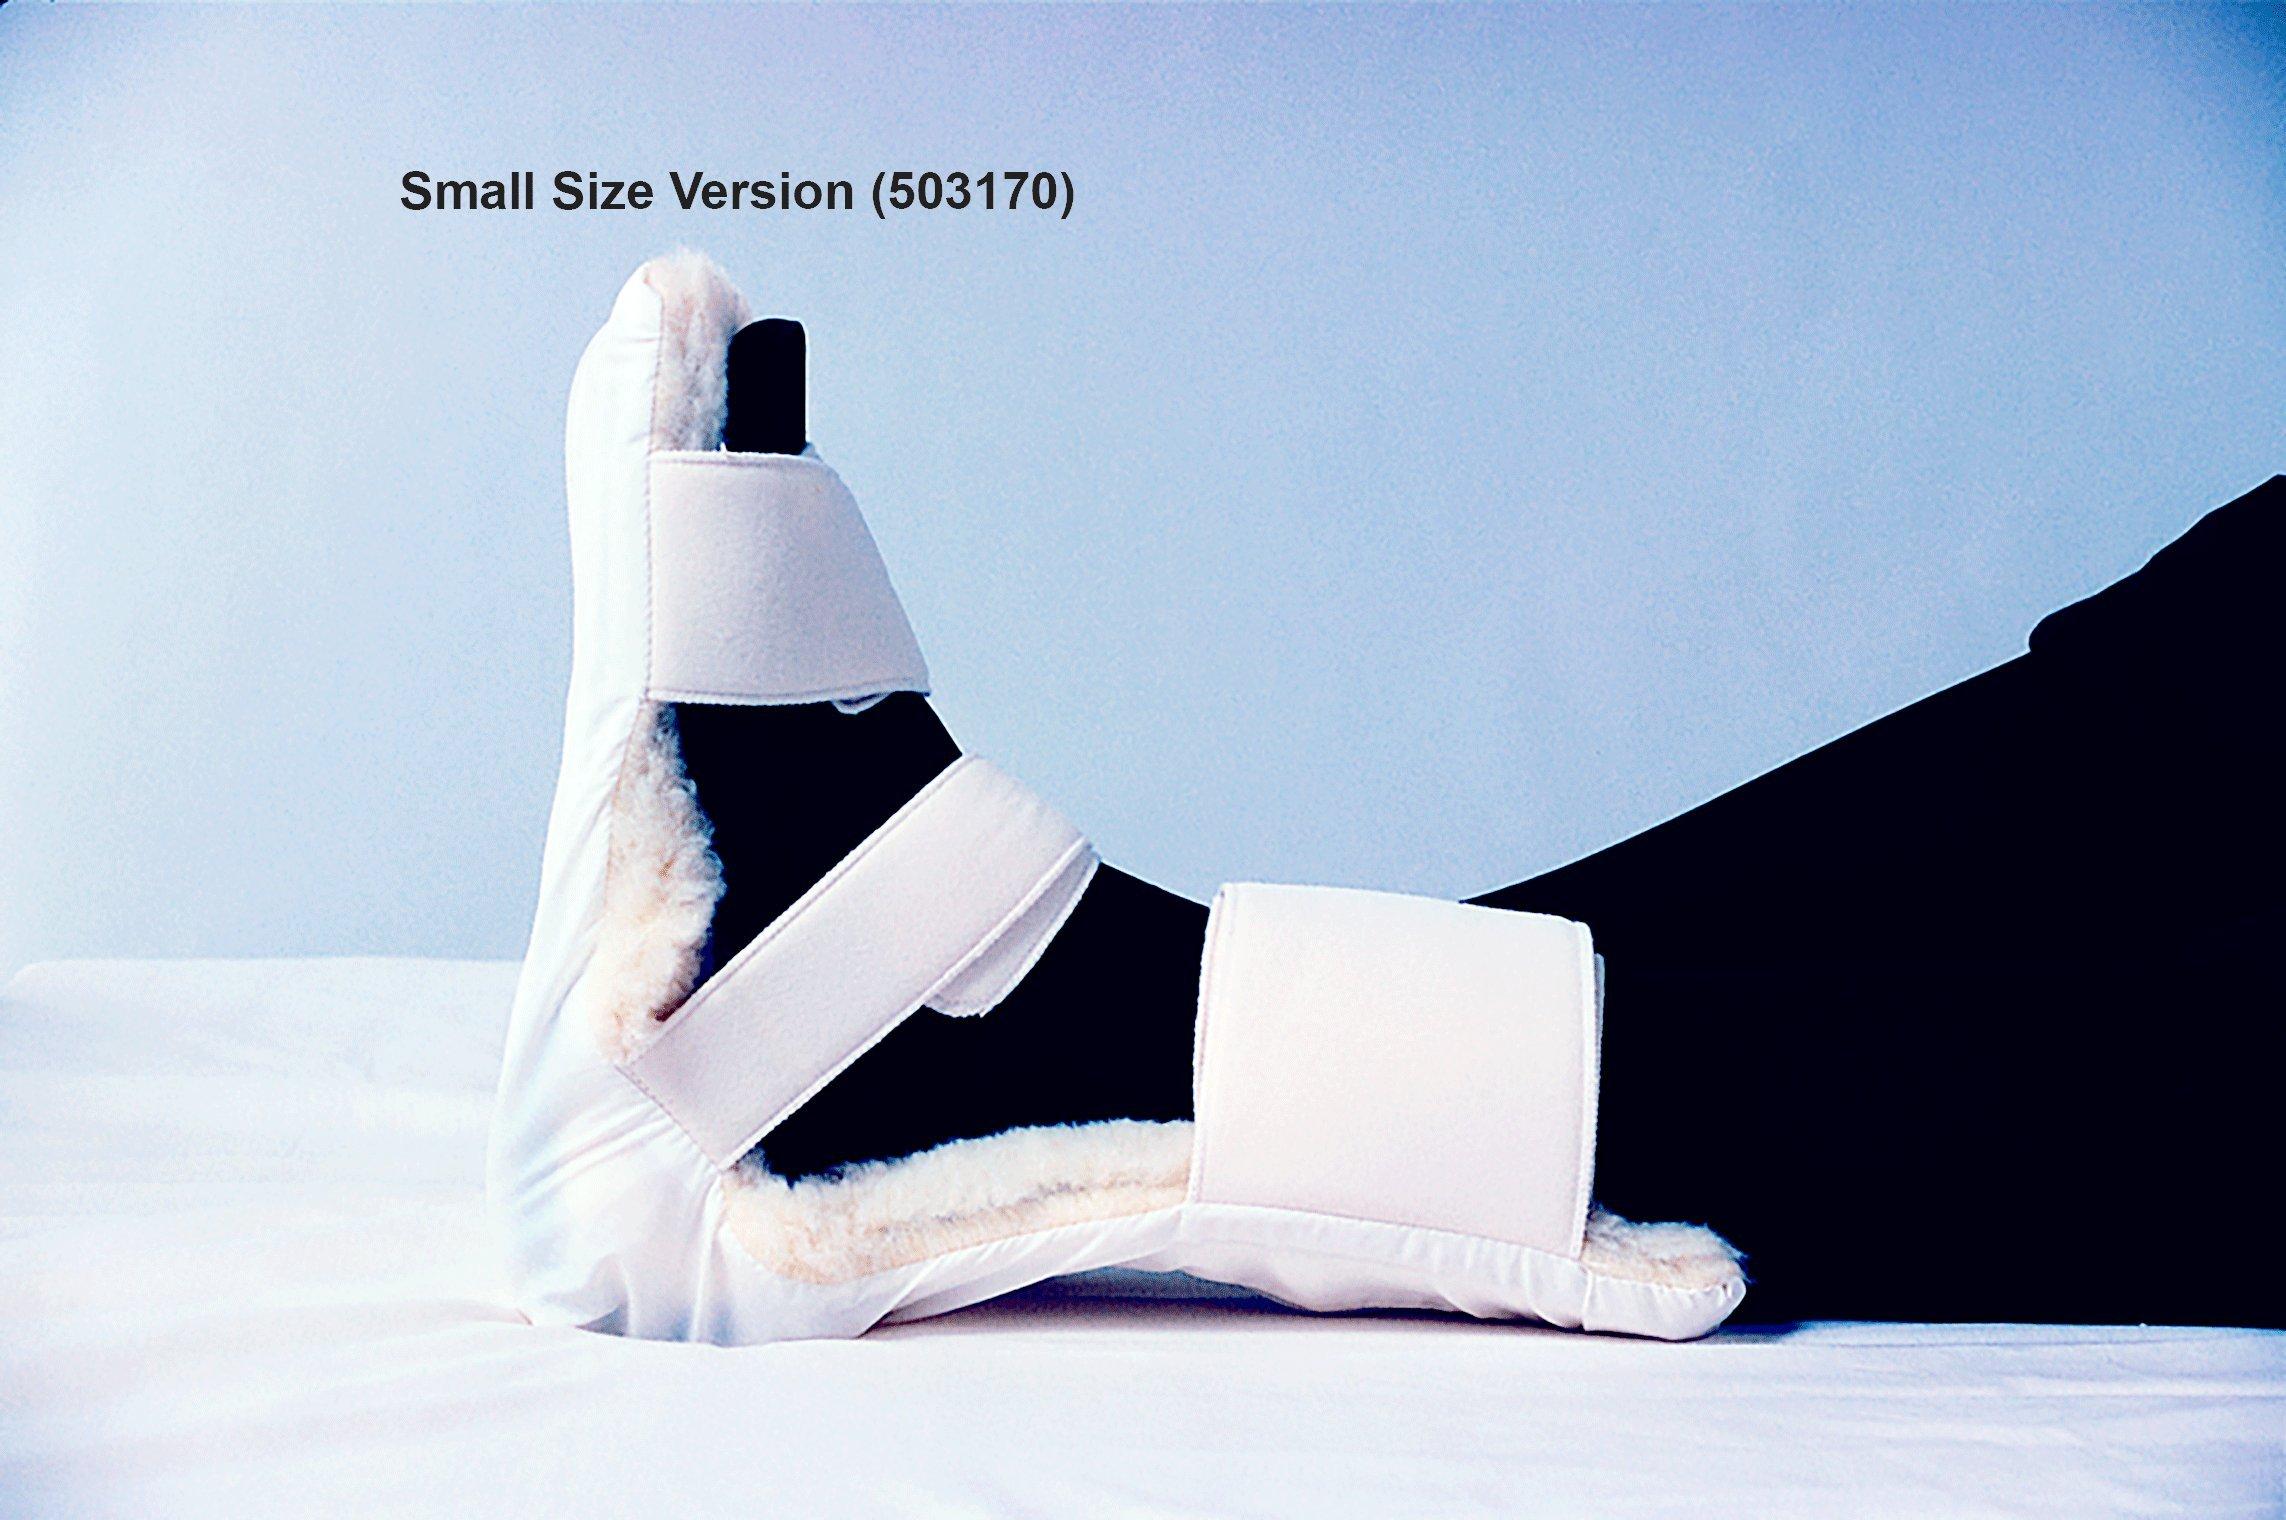 Skil-Care Foot Drop Boot MEDIUM